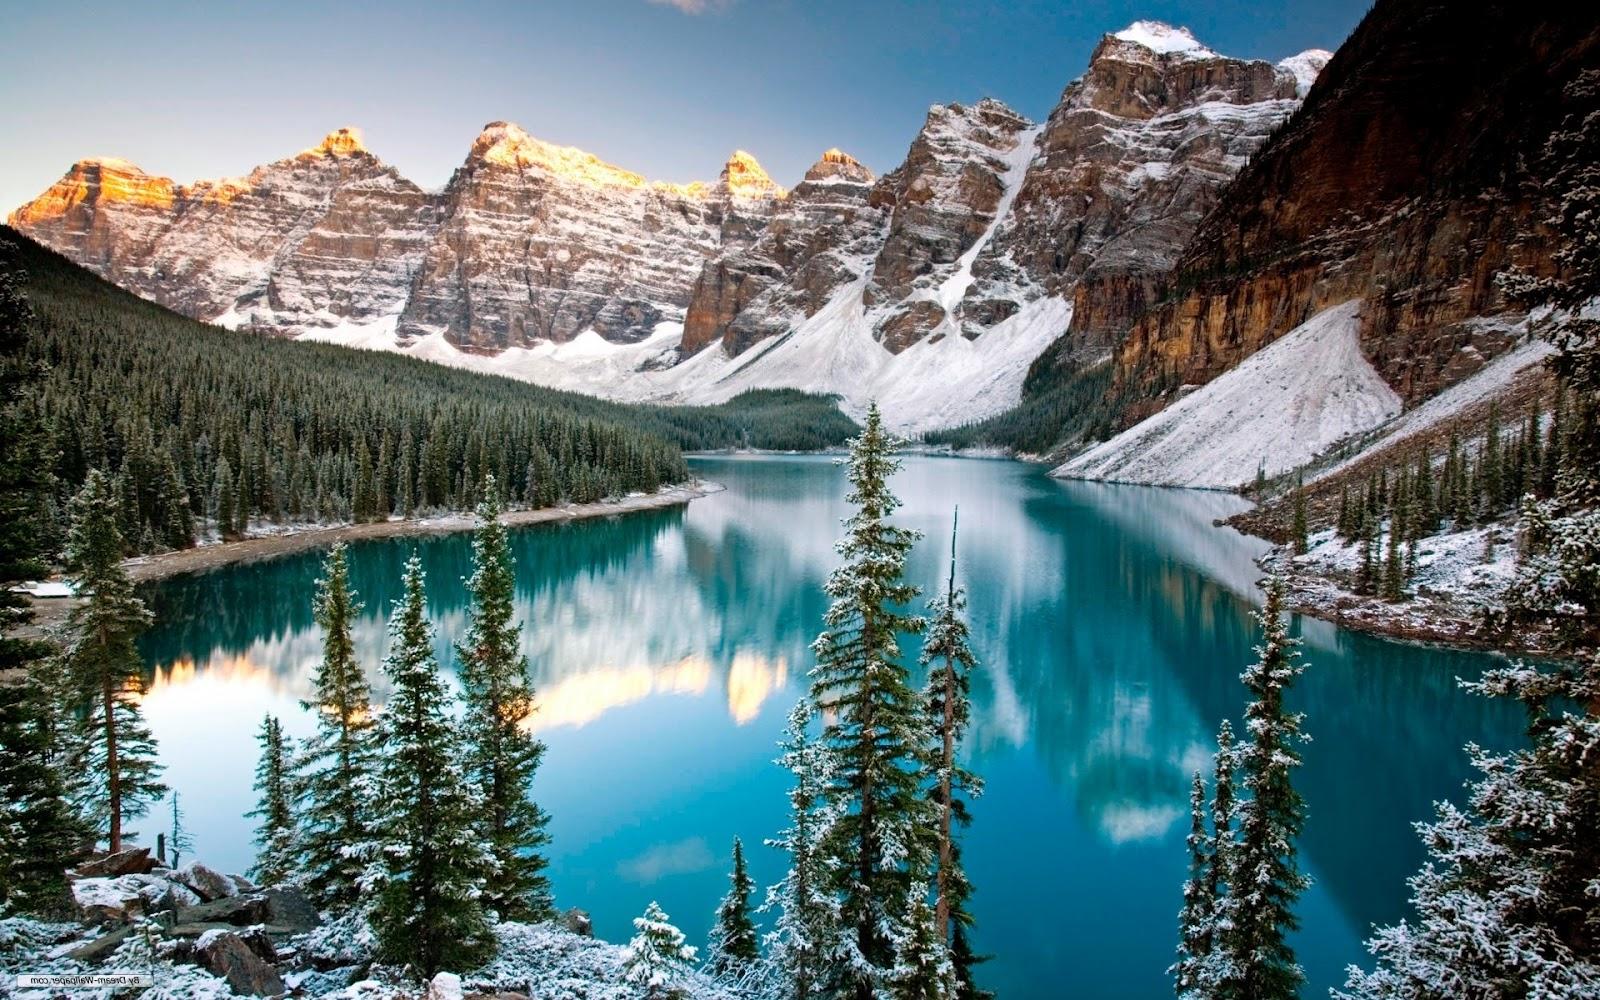 Download Wallpaper Mountain Winter - winter-mountain-Lake-desktop-wallpaper-free-download-pic  Perfect Image Reference_6911100.jpg